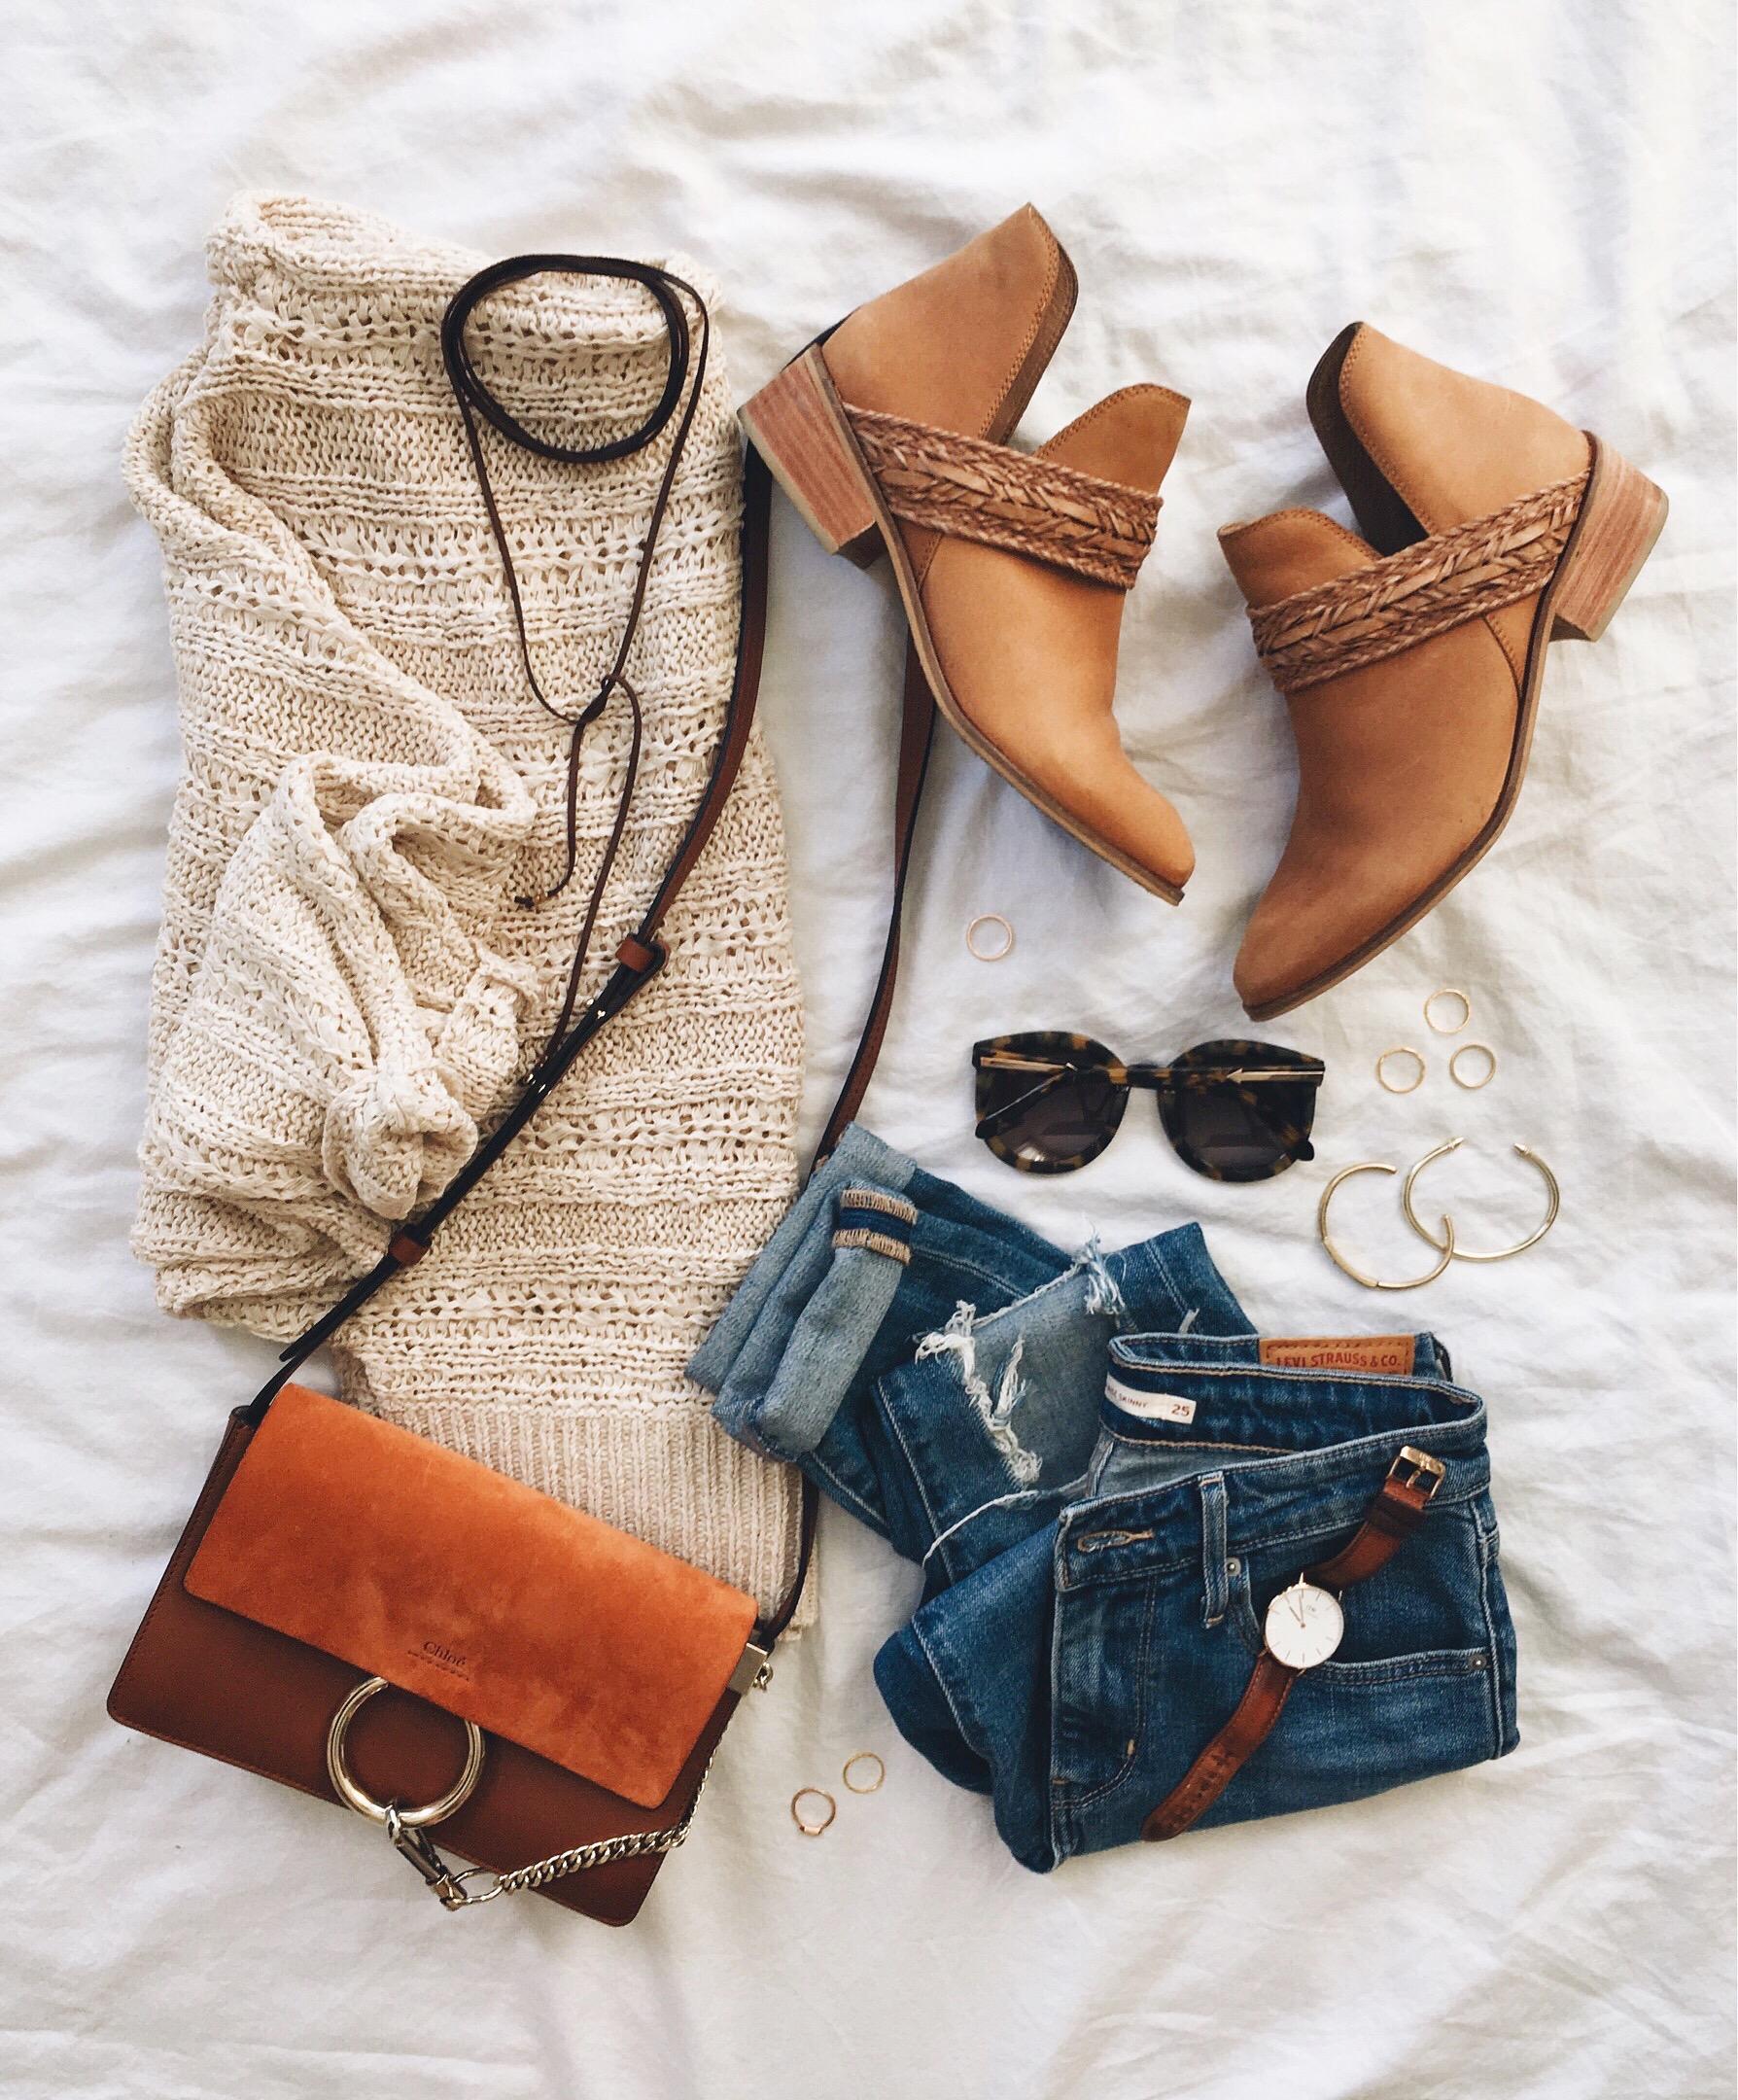 livvyland-blog-olivia-watson-cozy-boho-outfit-oversize-slouchy-sweater-chloe-faye